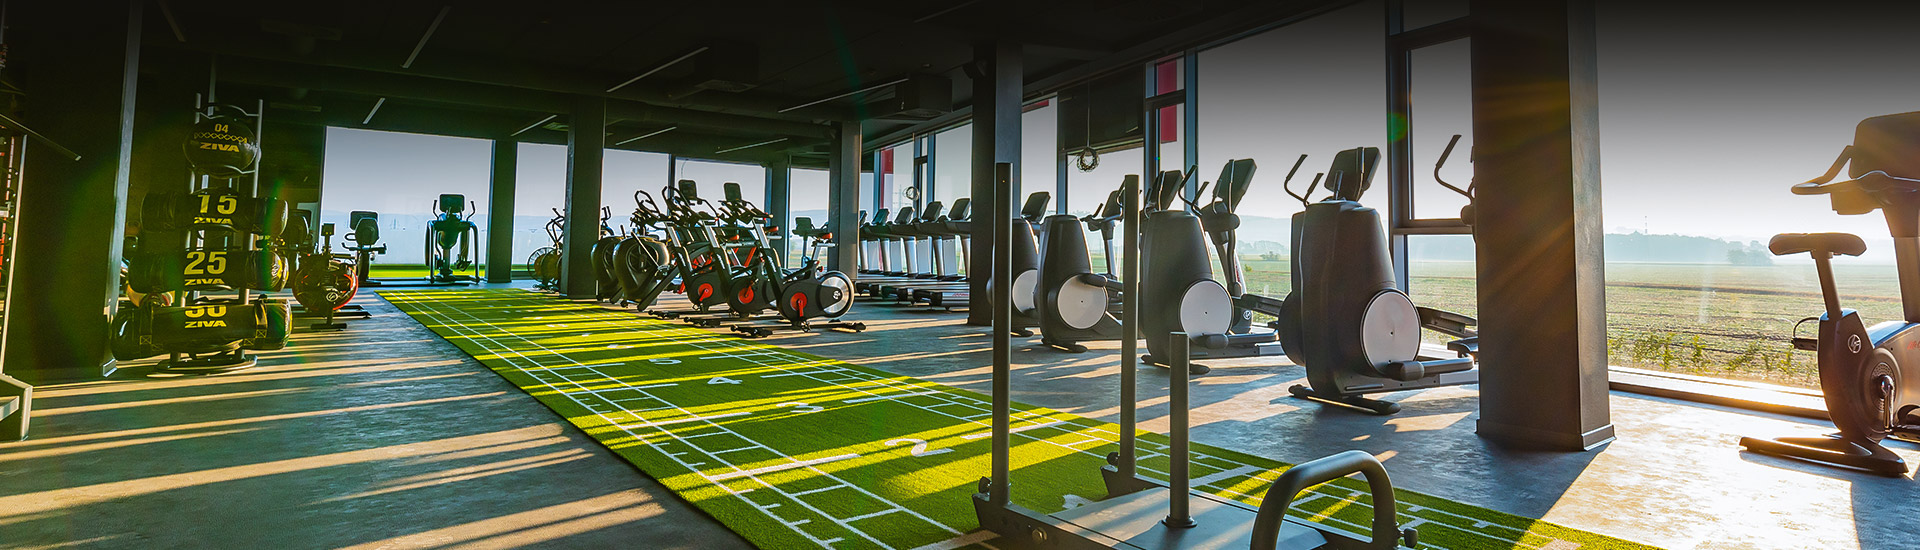 Fitness fitko Nutrend world Olomouc